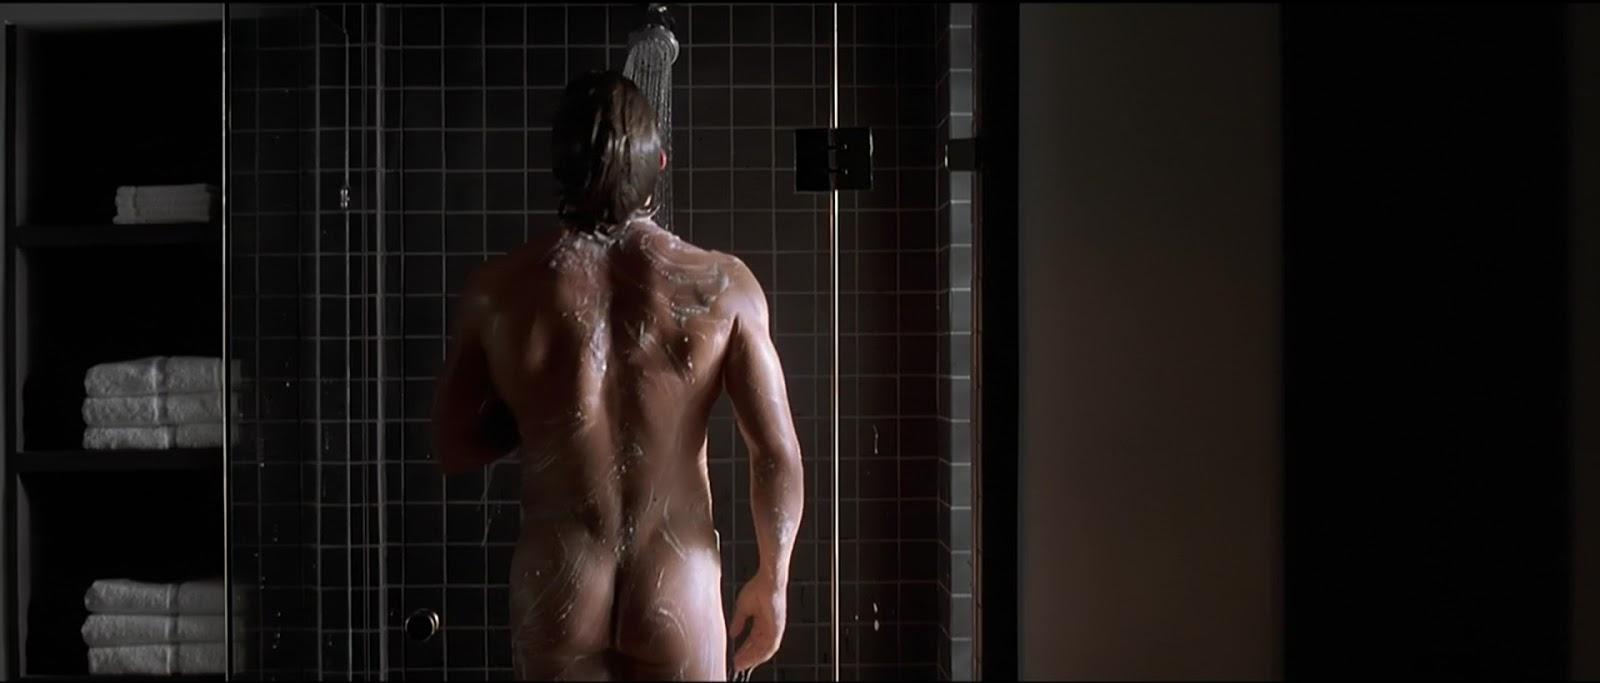 Christian bale nude gay